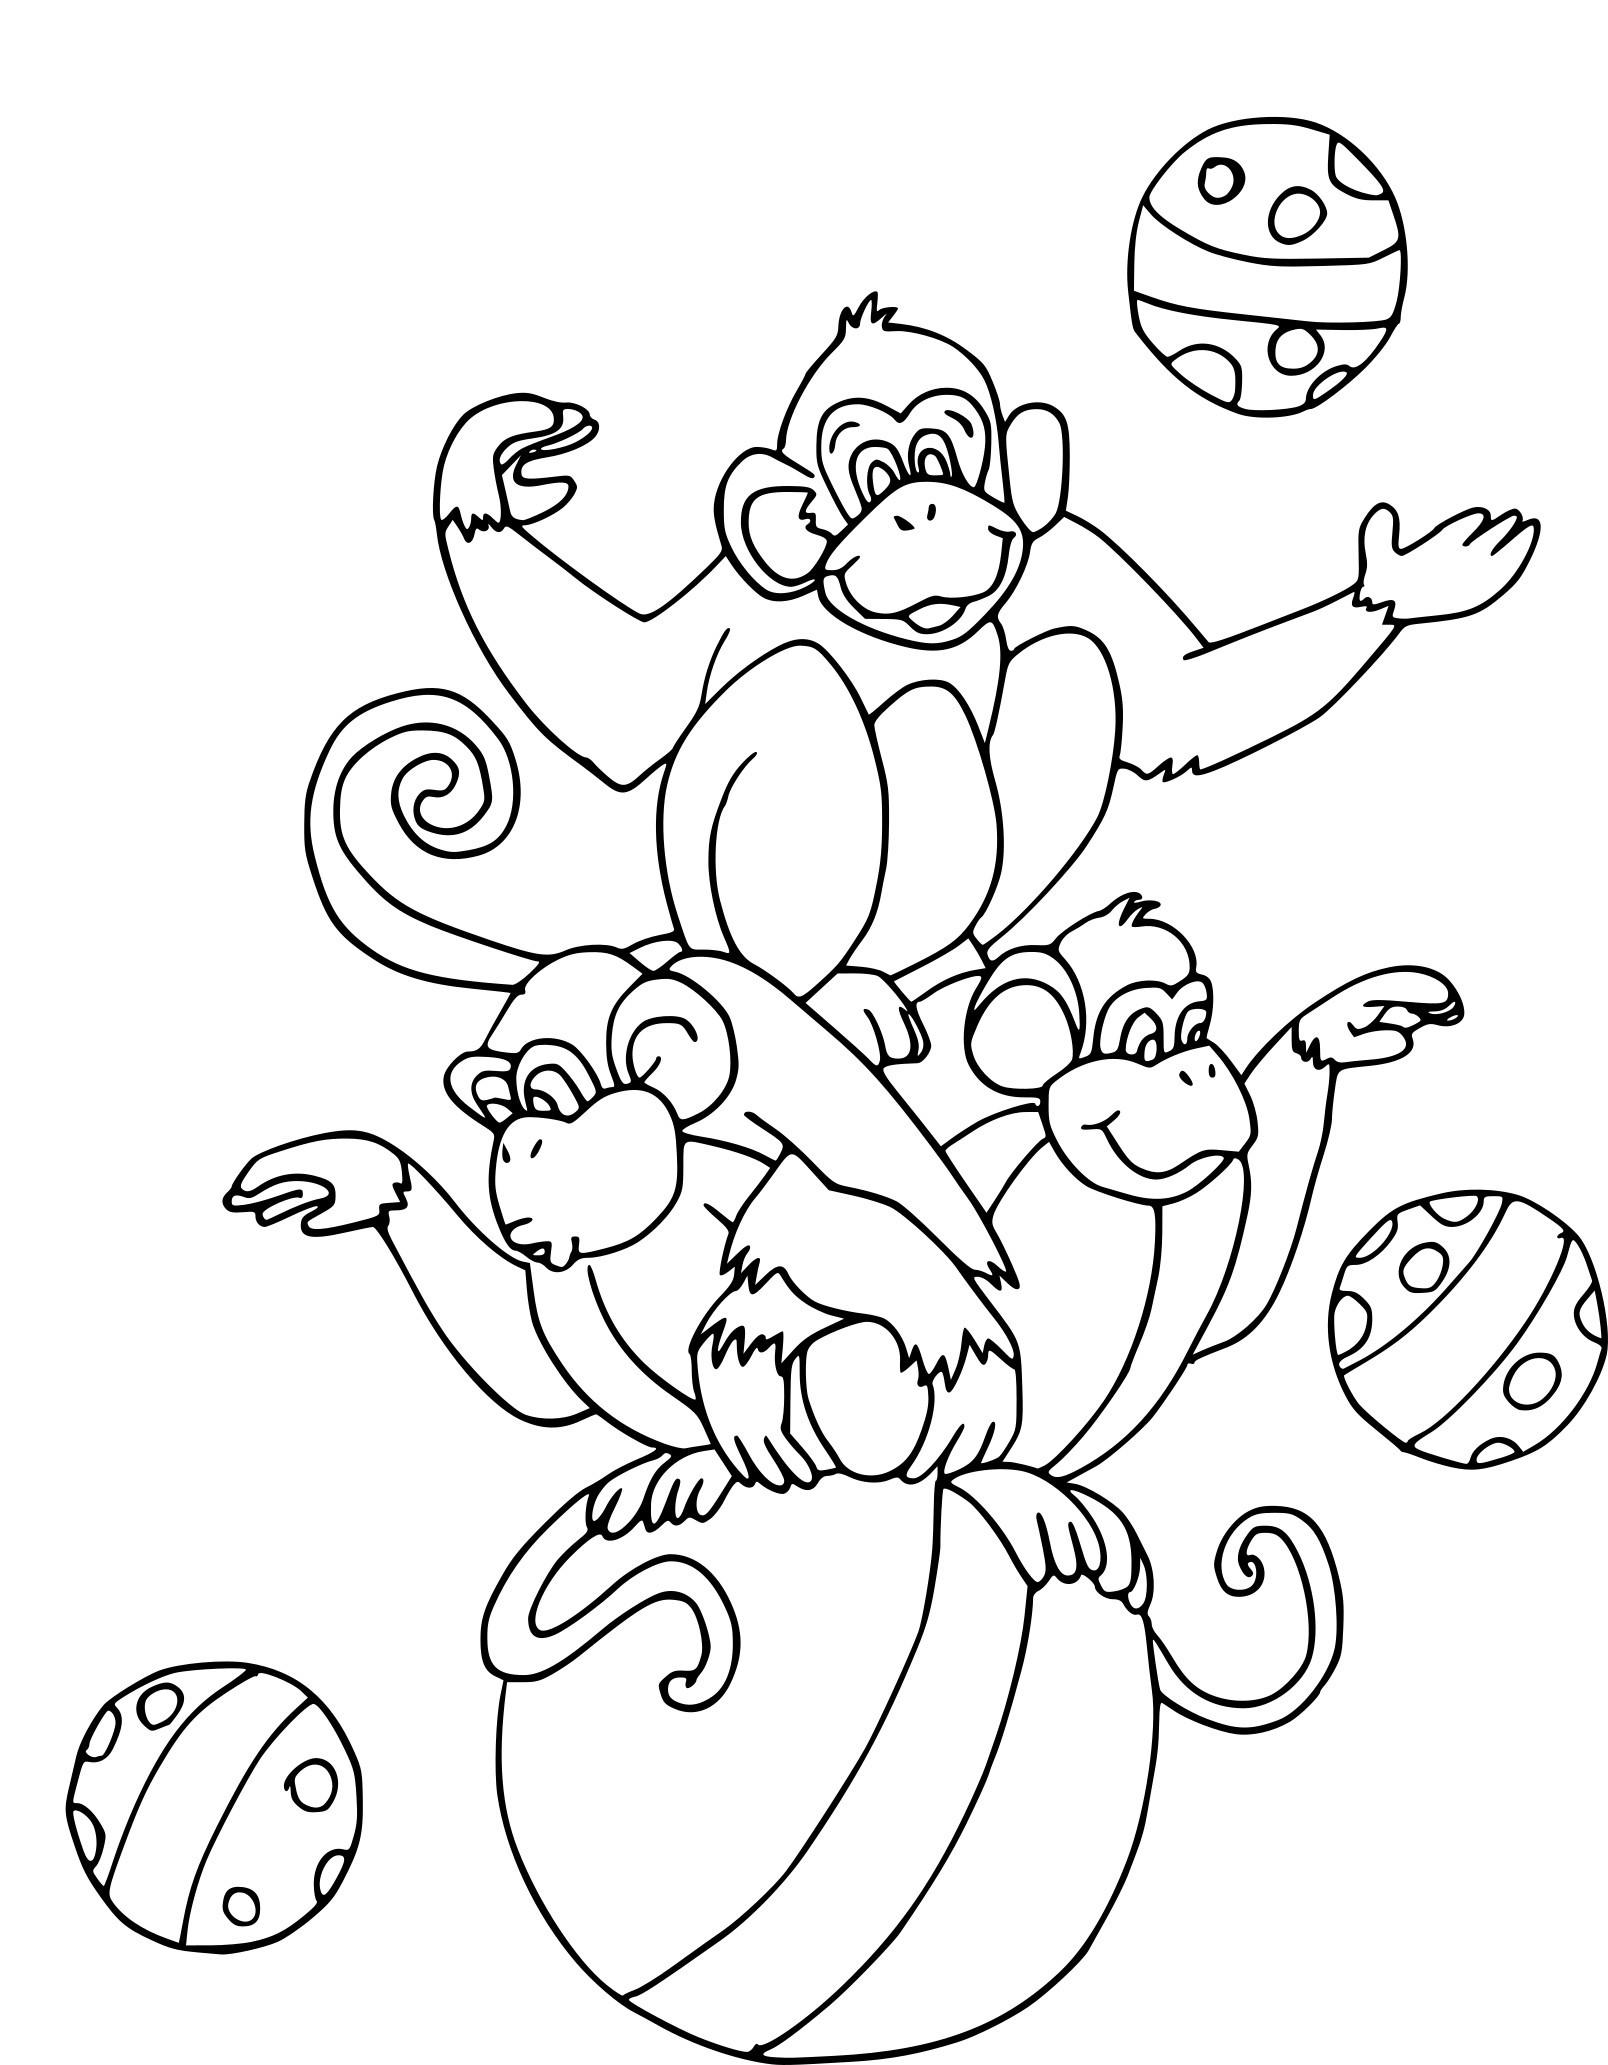 Coloriage singe jongleur